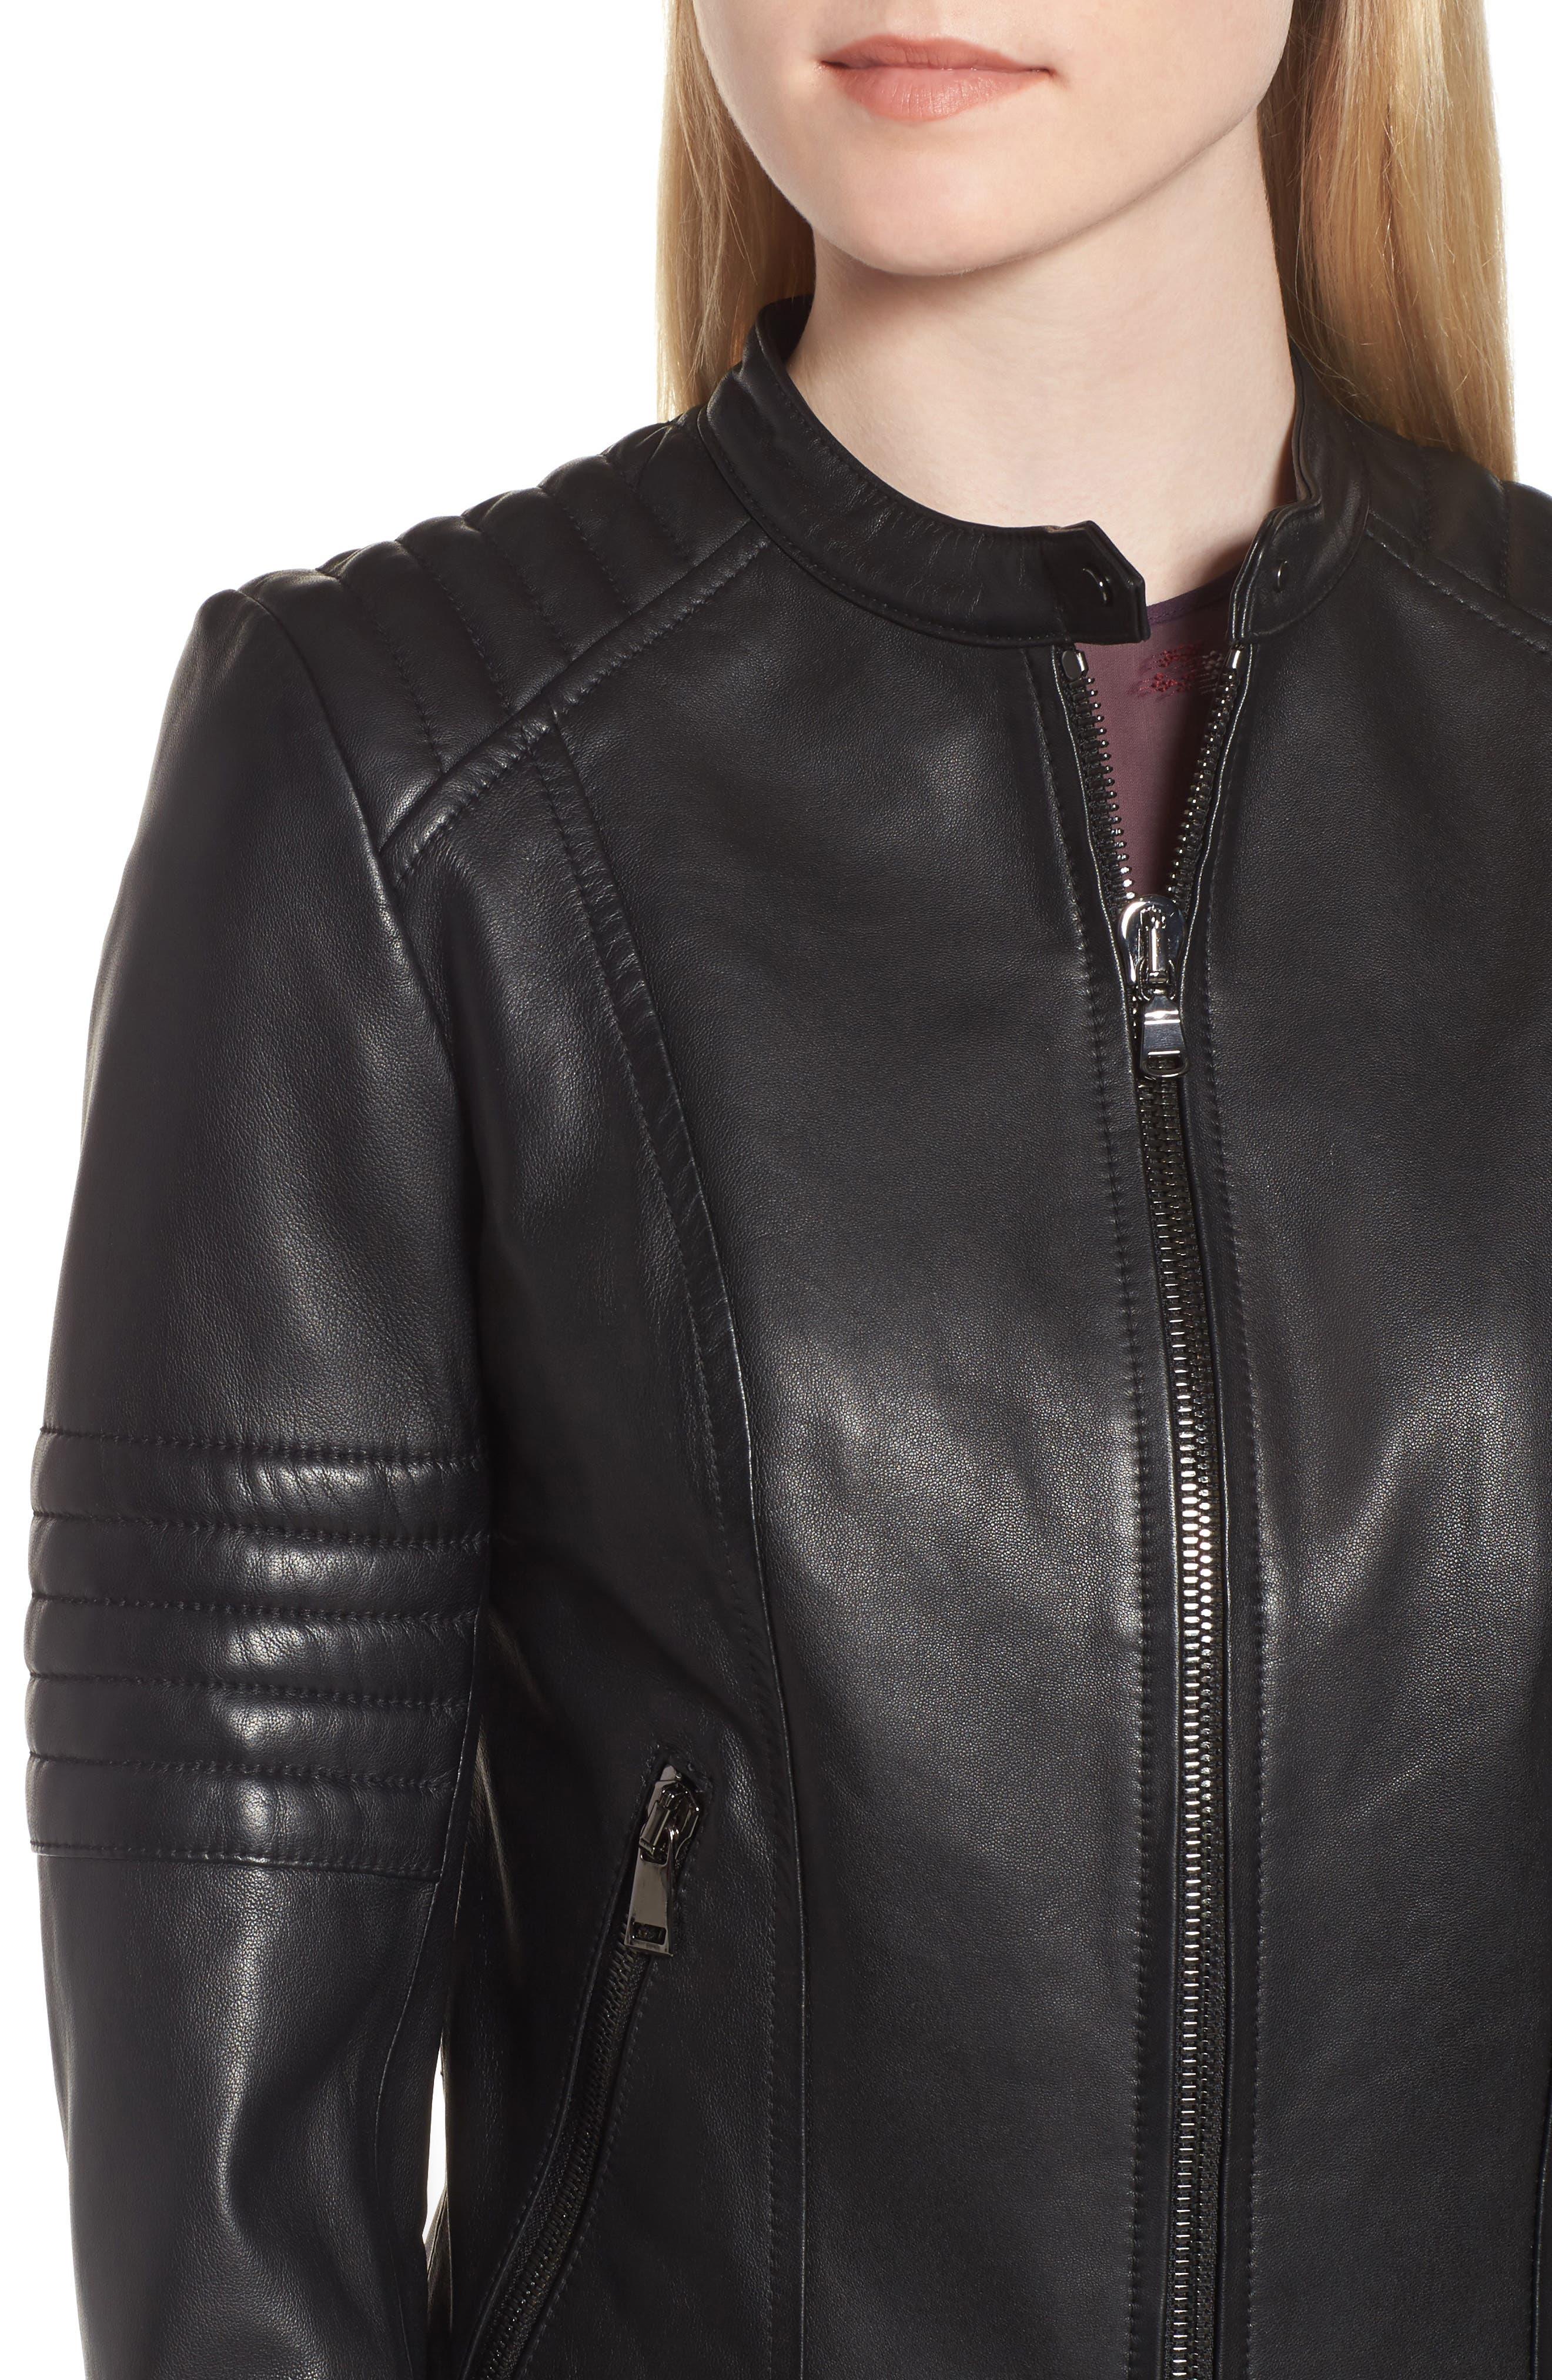 Quilted Sleeve Leather Biker Jacket,                             Alternate thumbnail 4, color,                             Black